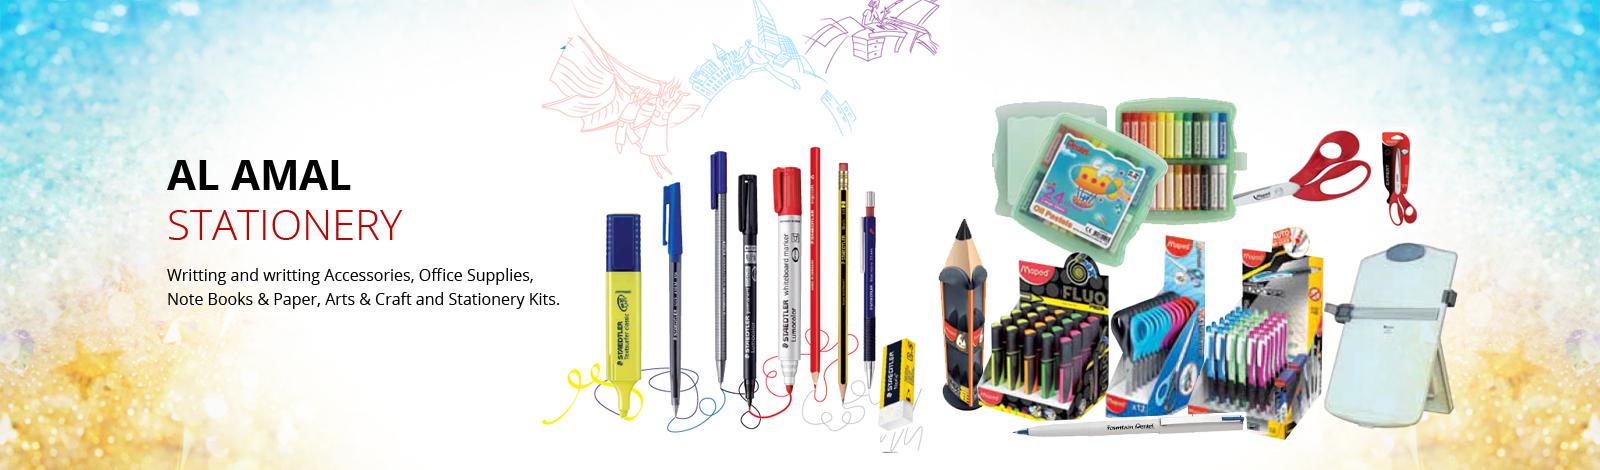 Best Office Stationery Suppliers In Dubai Abu Dhabi Uae 1 Equipment Online